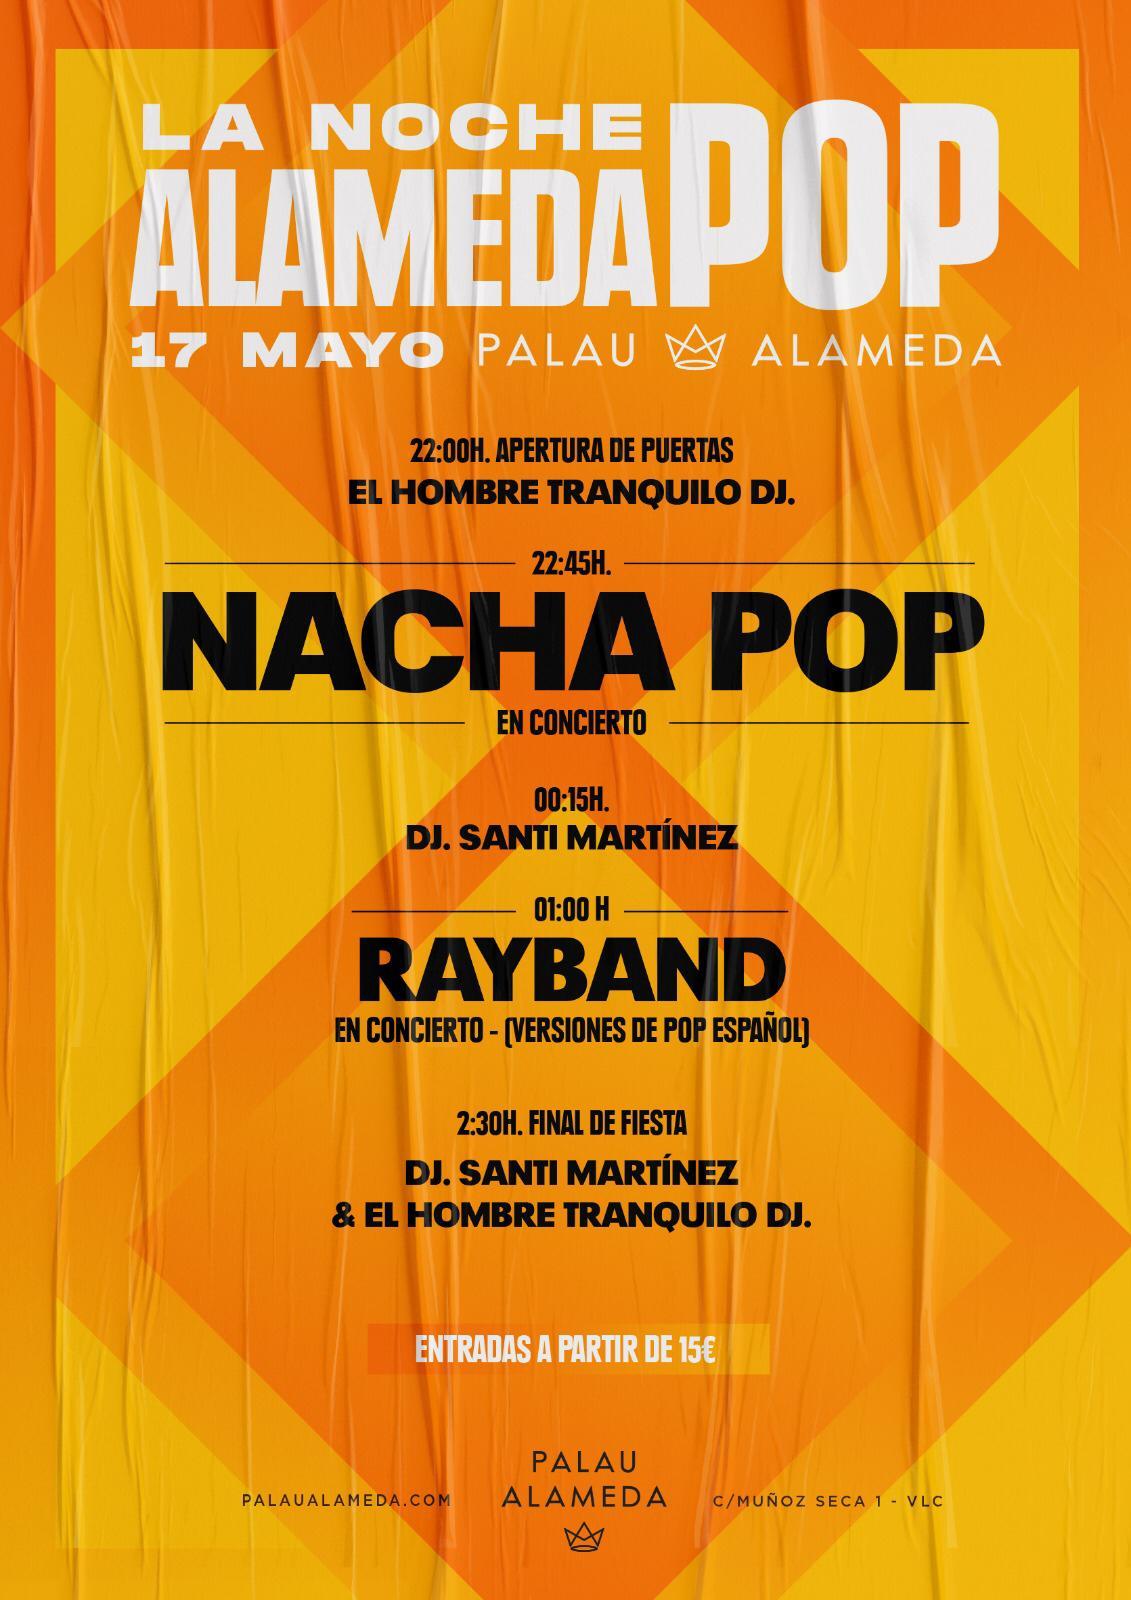 Nacha Pop en Palau Alameda